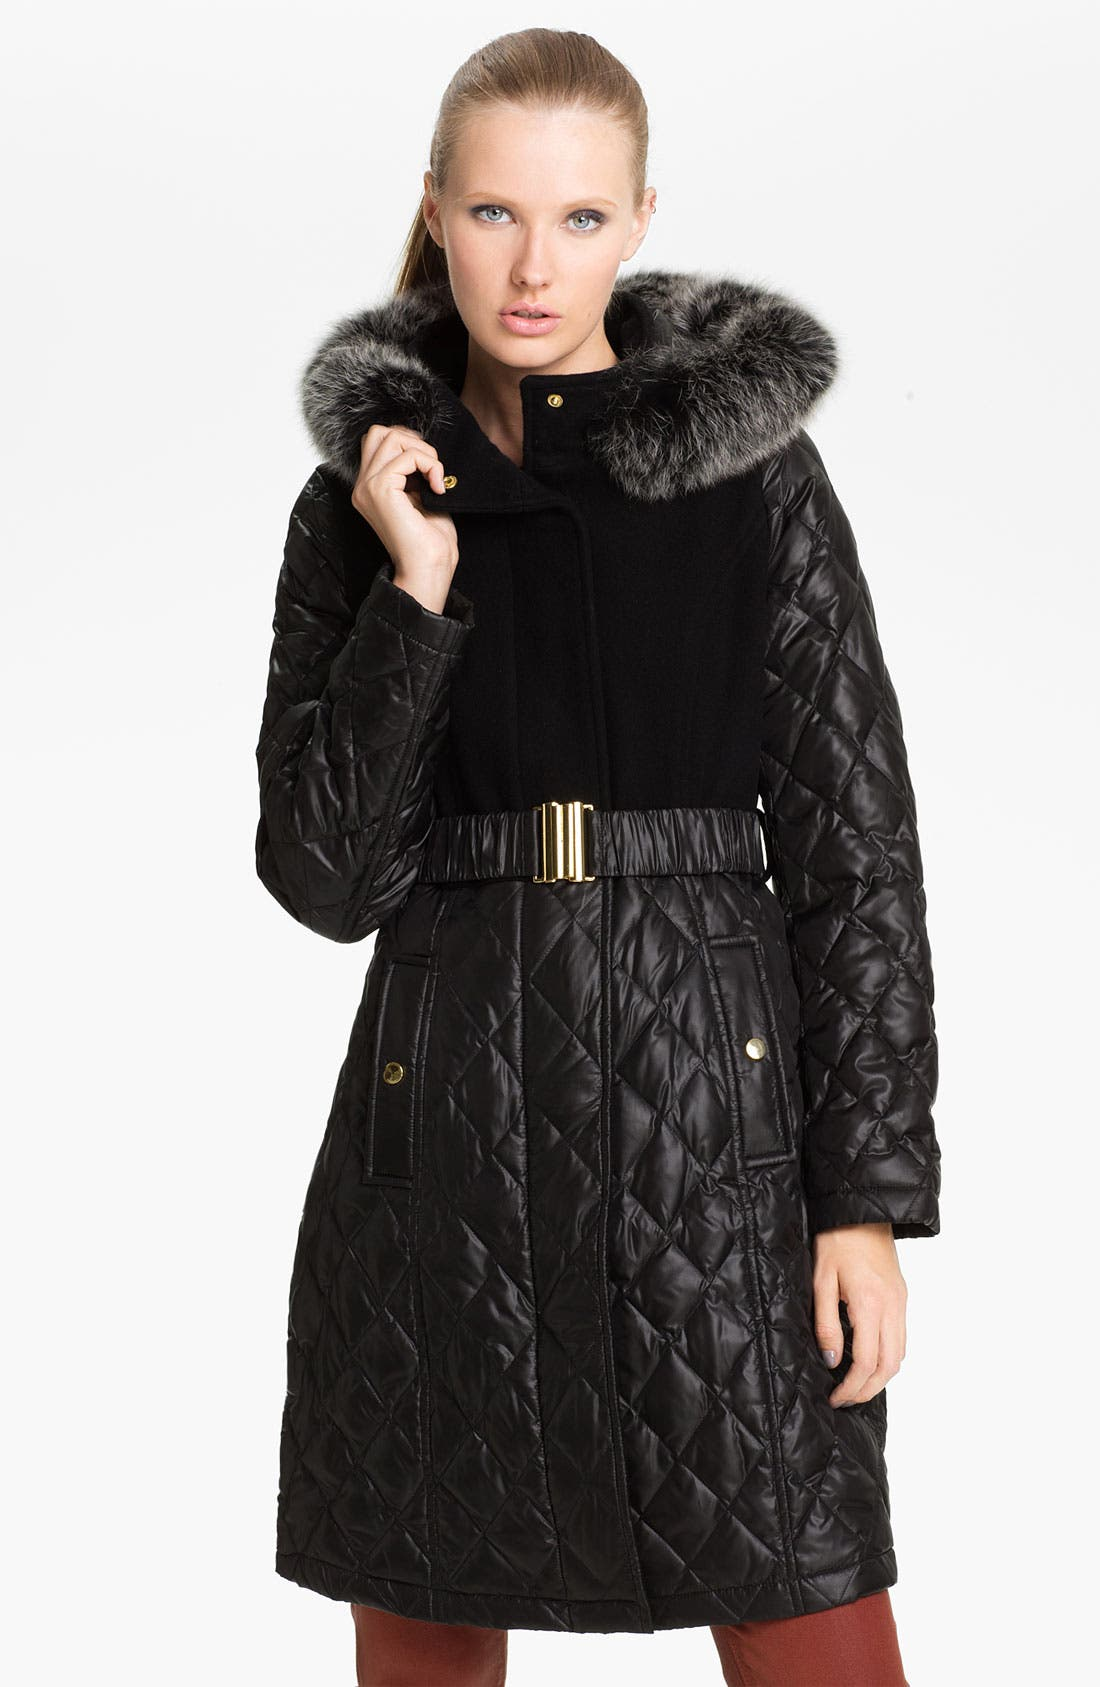 Alternate Image 1 Selected - Sachi Mix Media Coat with Genuine Fox Fur Trim